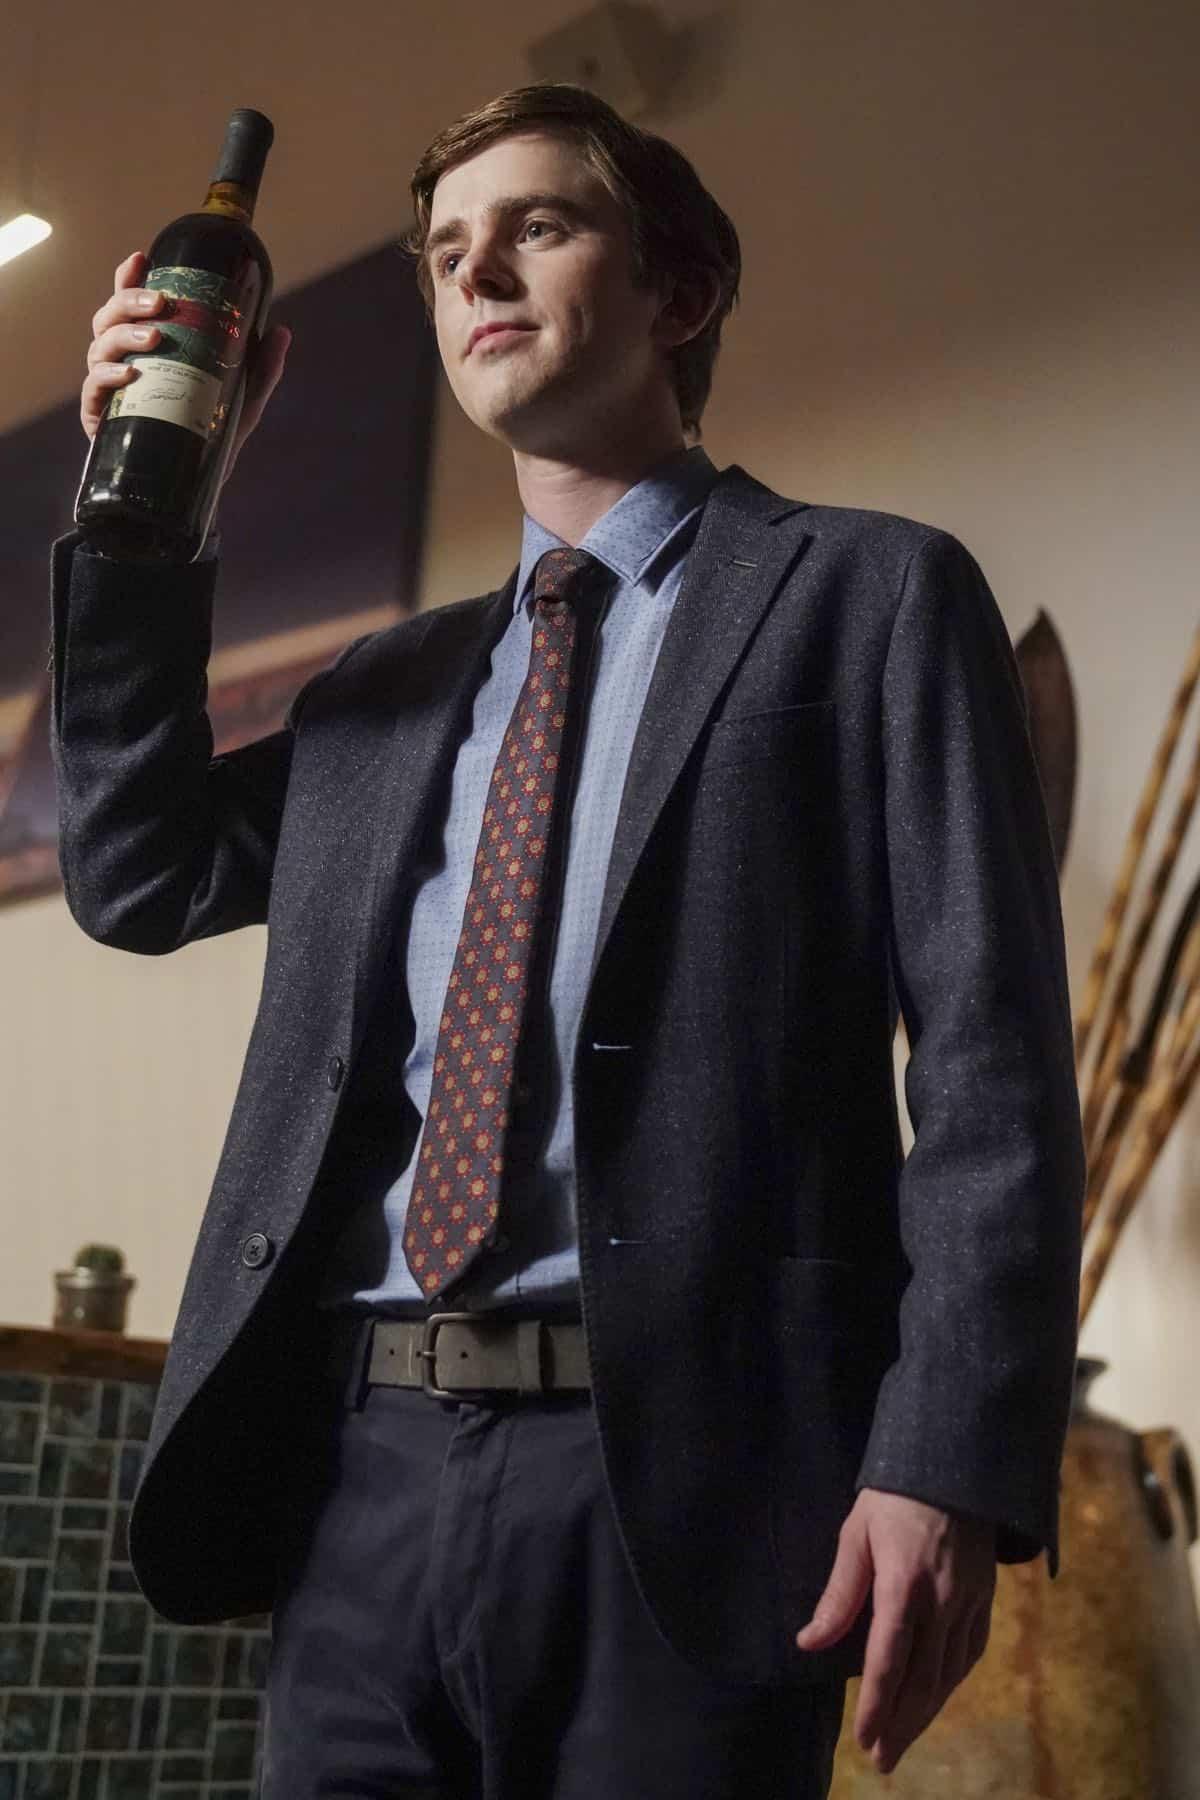 THE GOOD DOCTOR Season 3 Episode 1 Disaster 39